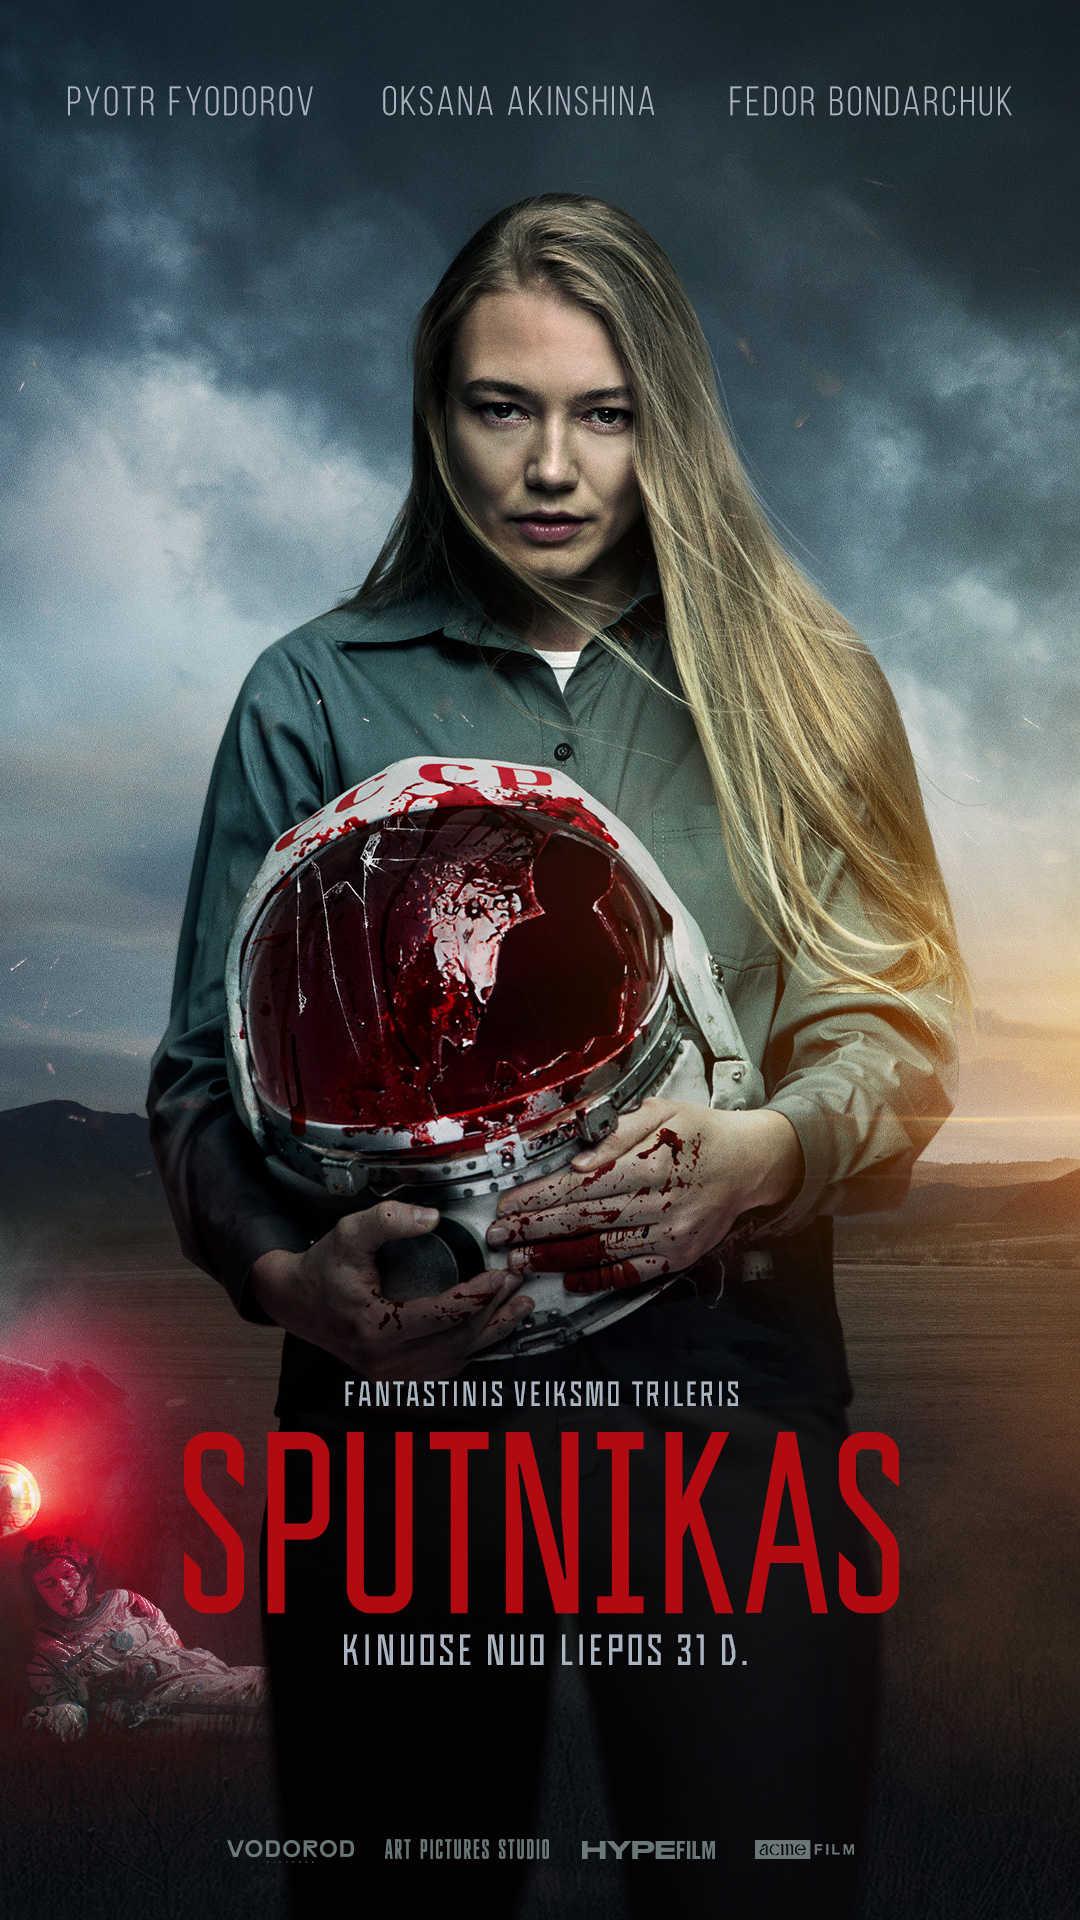 SPUTNIKAS (Sputnik)